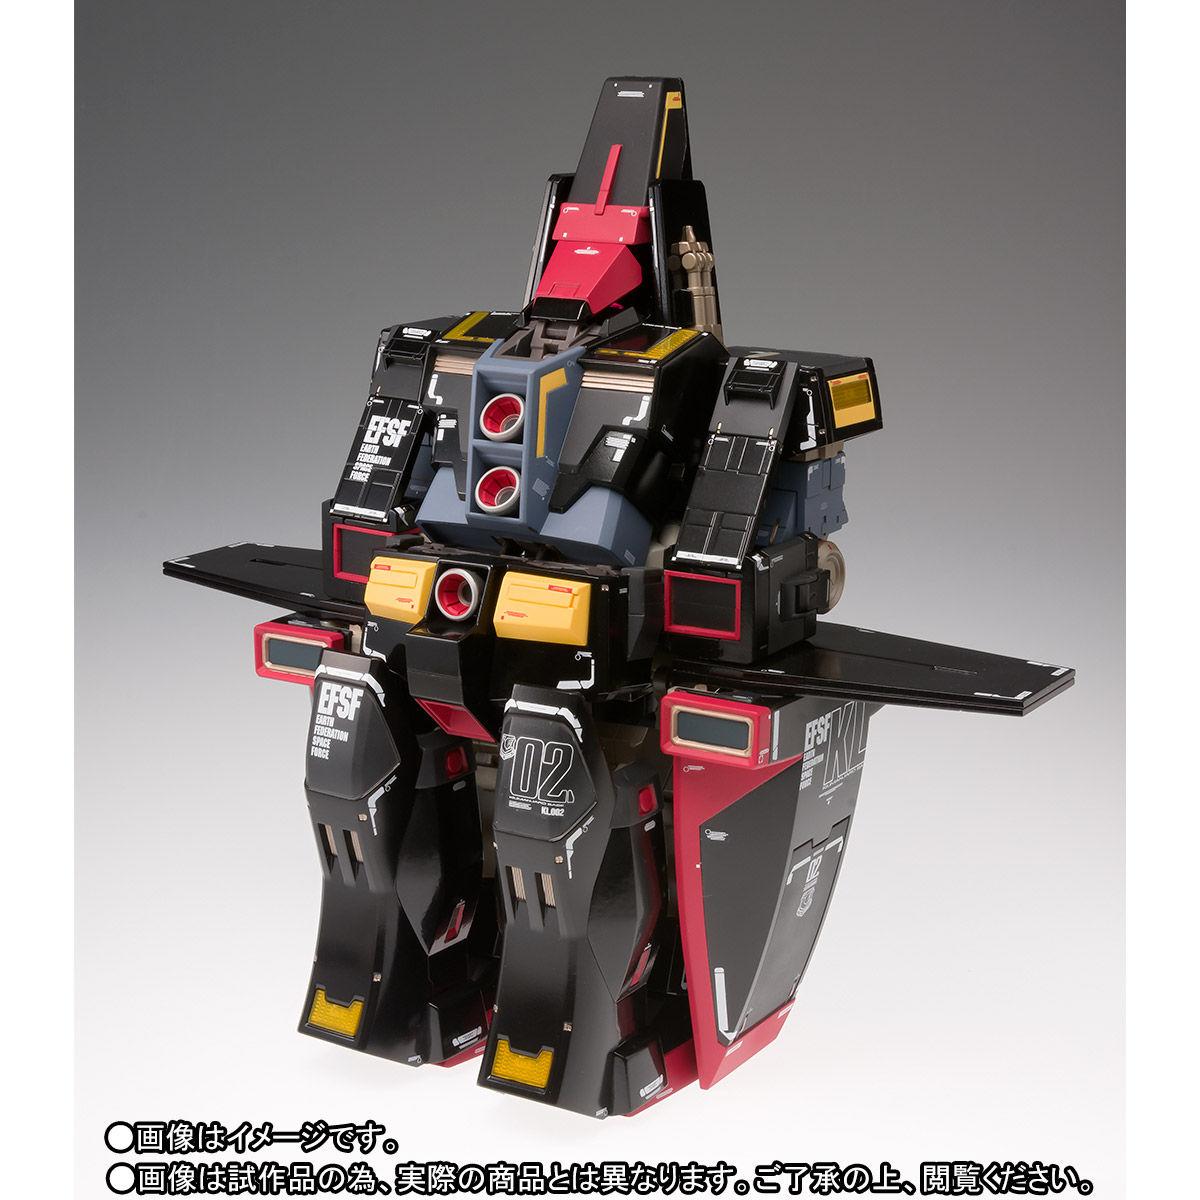 FIX FIGURATION METAL COMPOSITE『サイコ・ガンダム(グロスカラーVer.)』機動戦士Zガンダム アクションフィギュア-006